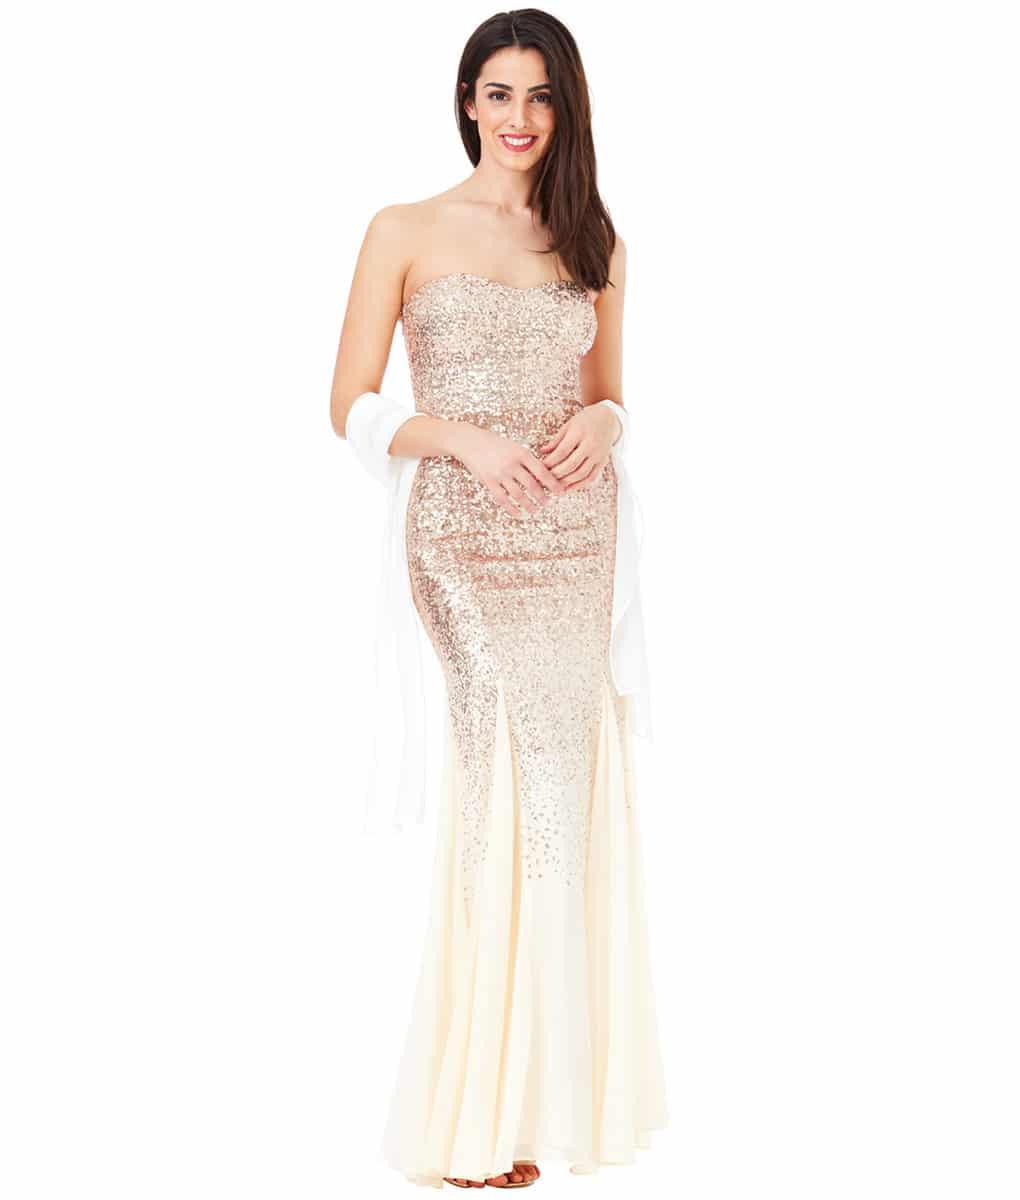 Ivory Strapless Dress